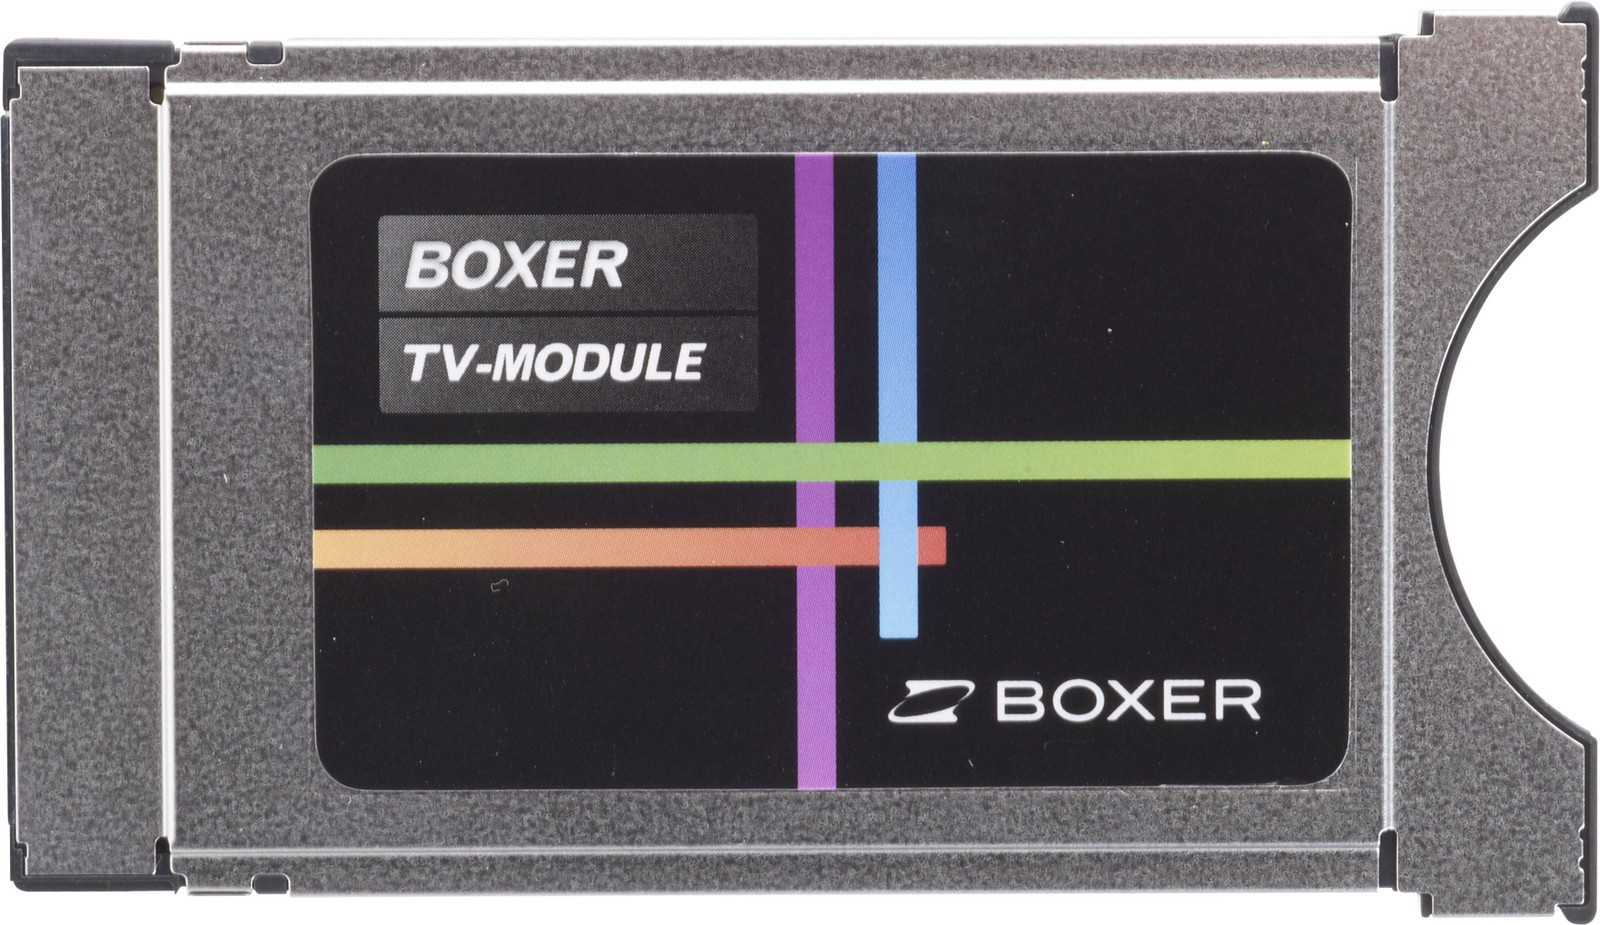 Neotion Viaccess CAM - Boxer